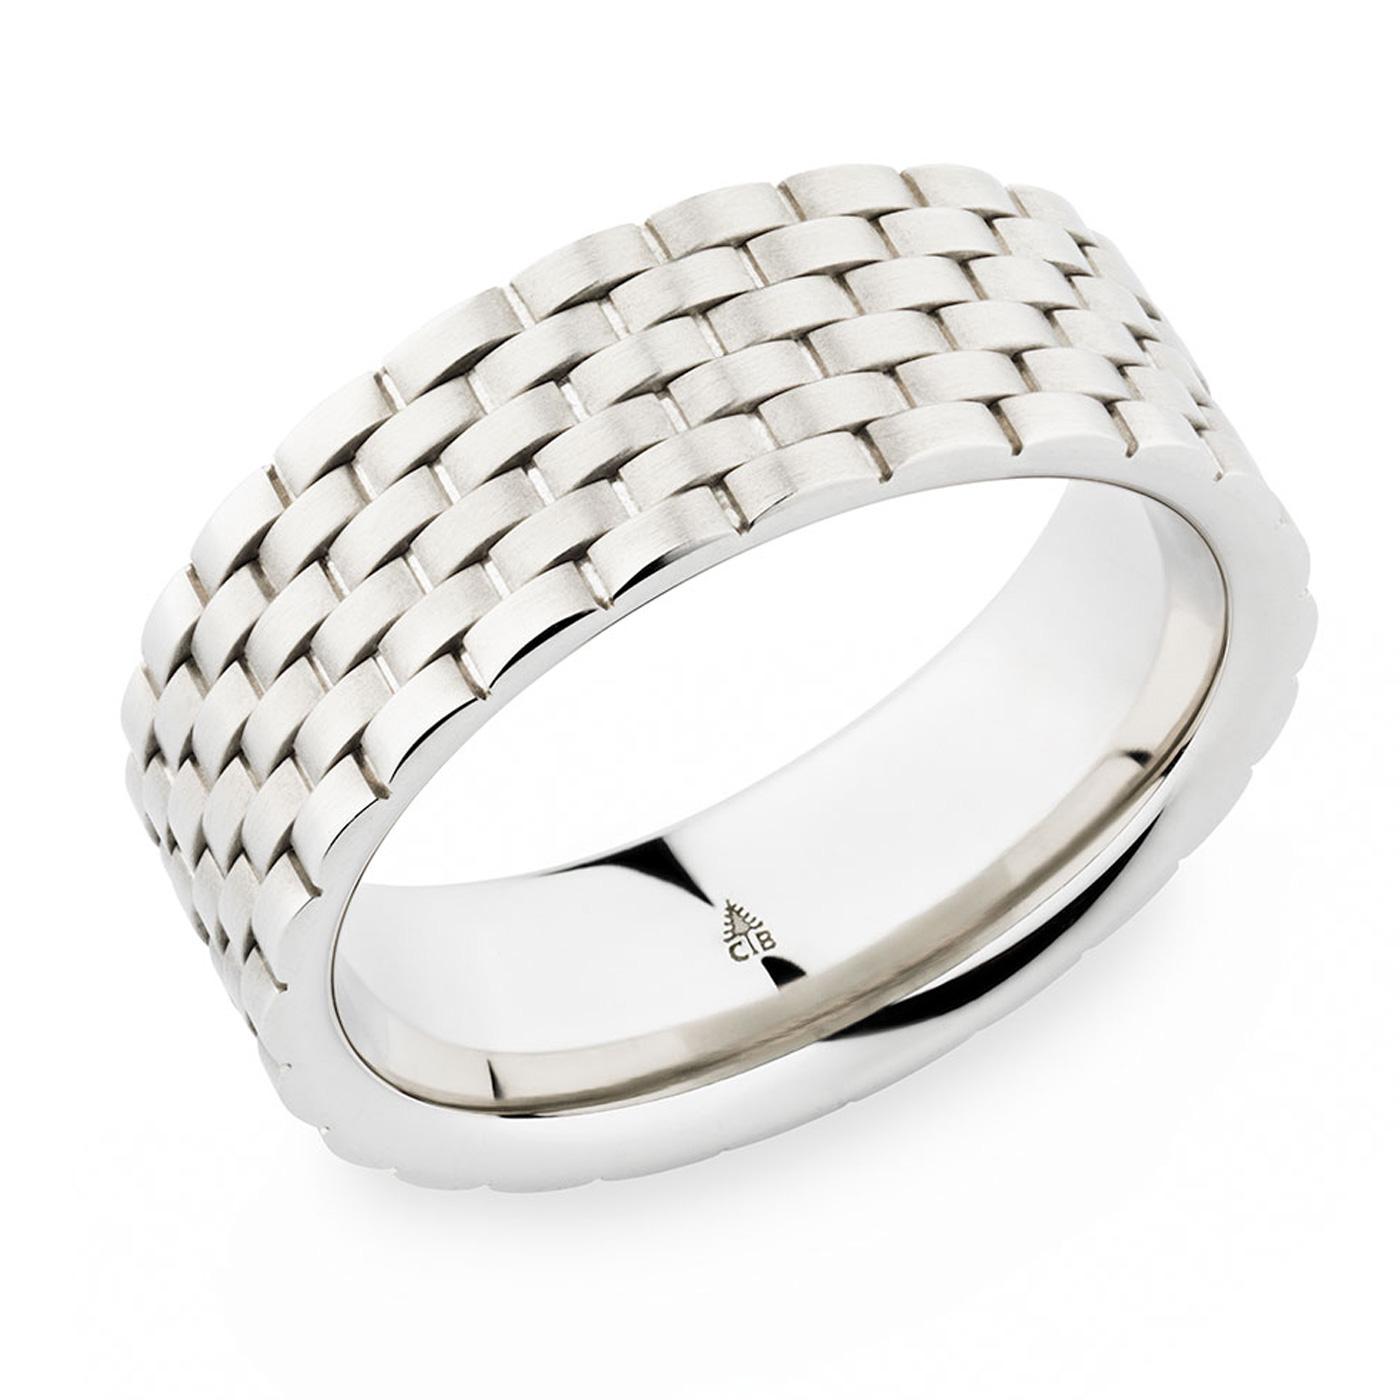 Christian Bauer Palladium Wedding Ring Band